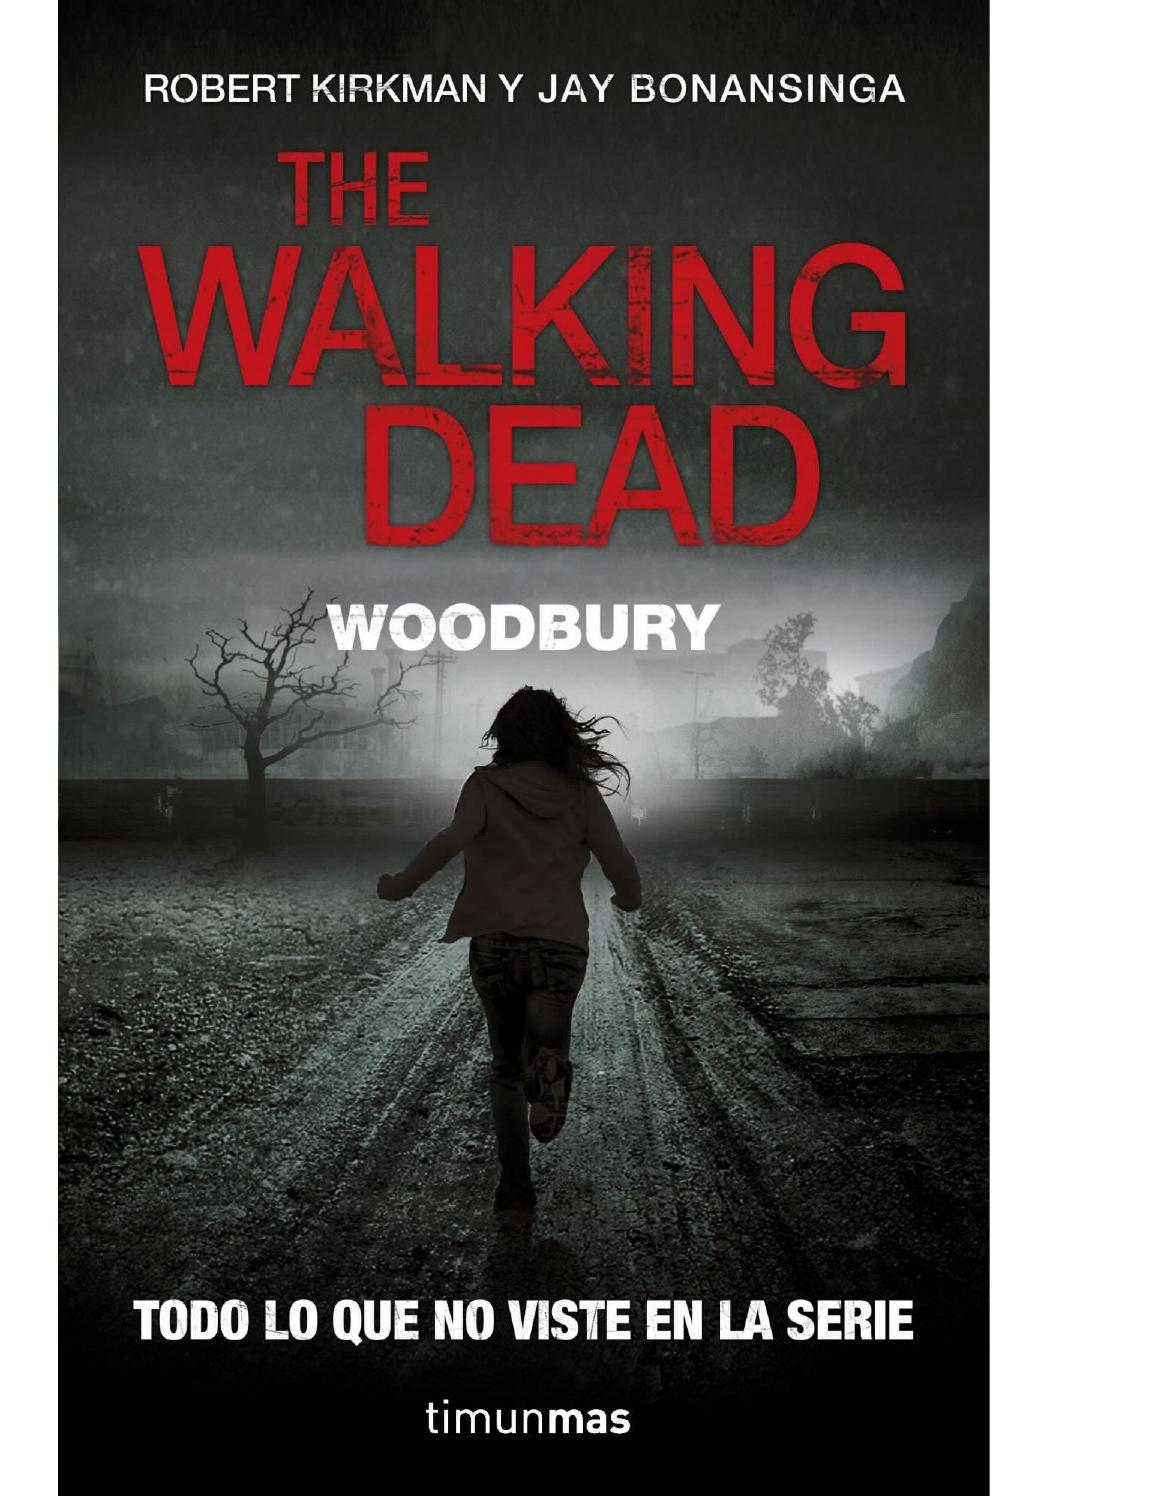 Woodbury by Francisco Romero issuu